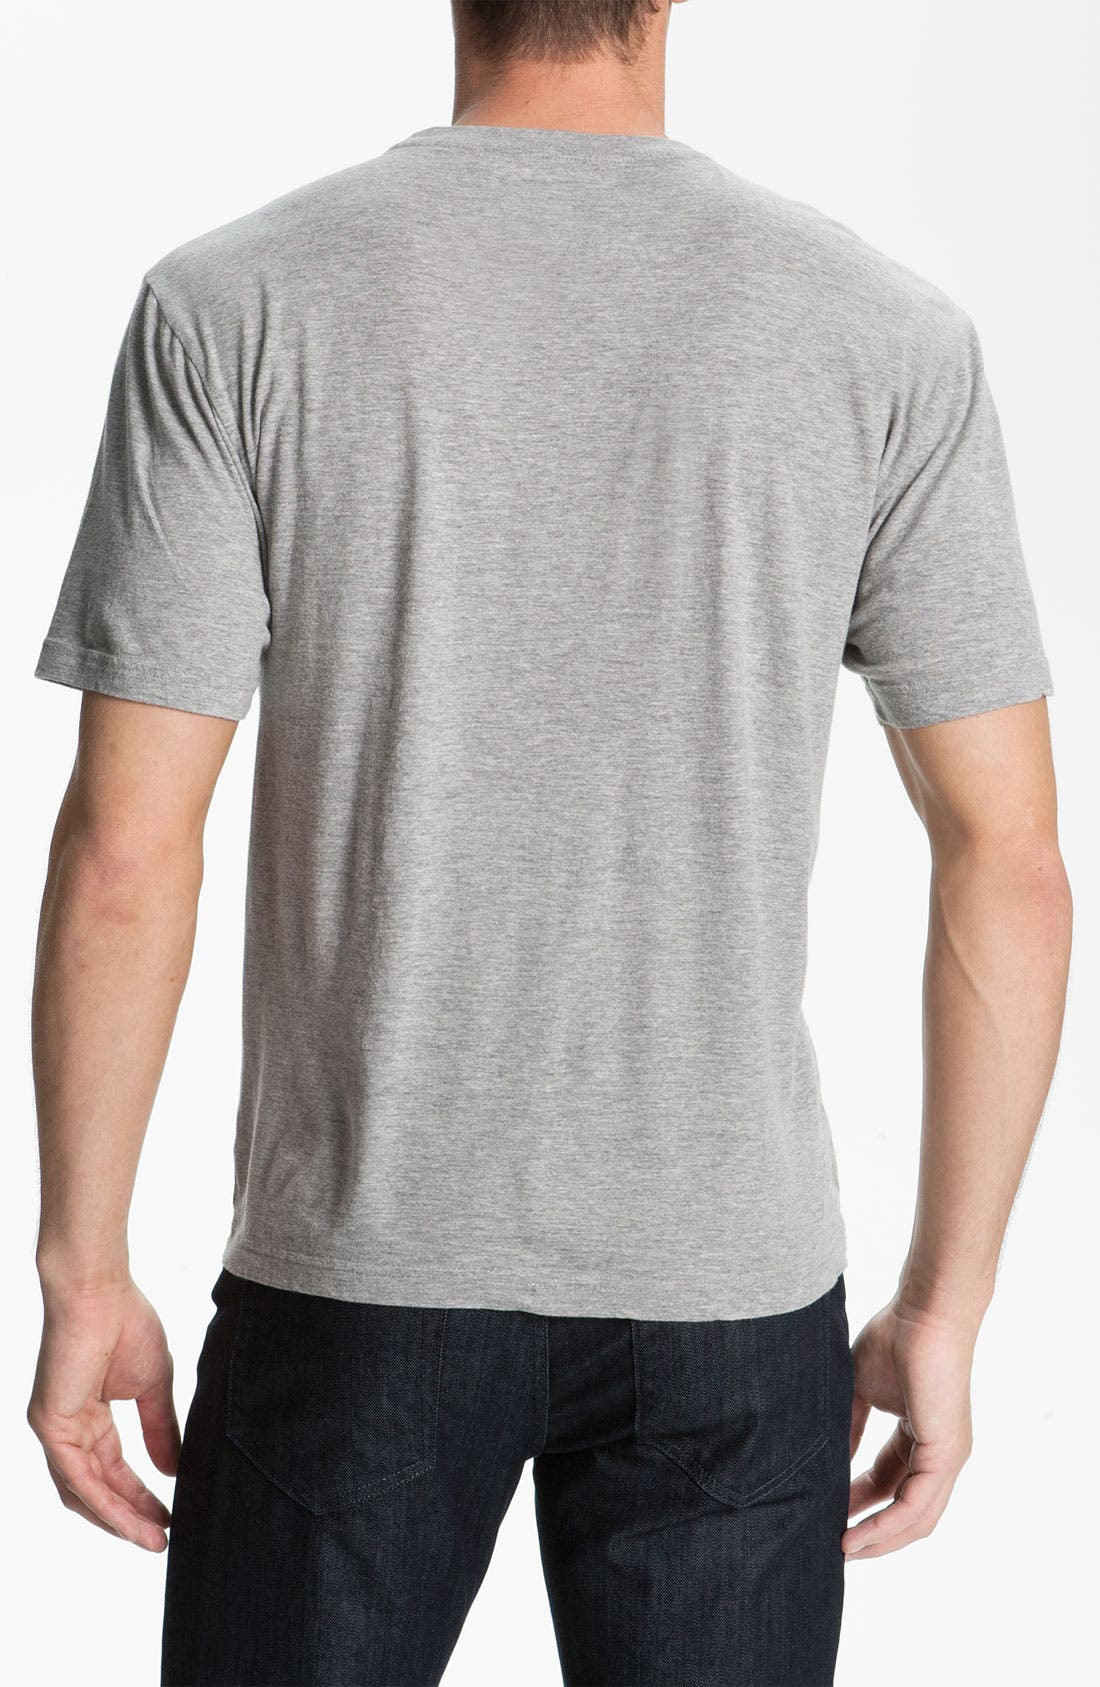 'San Francisco Giants' T-Shirt,                             Alternate thumbnail 3, color,                             020